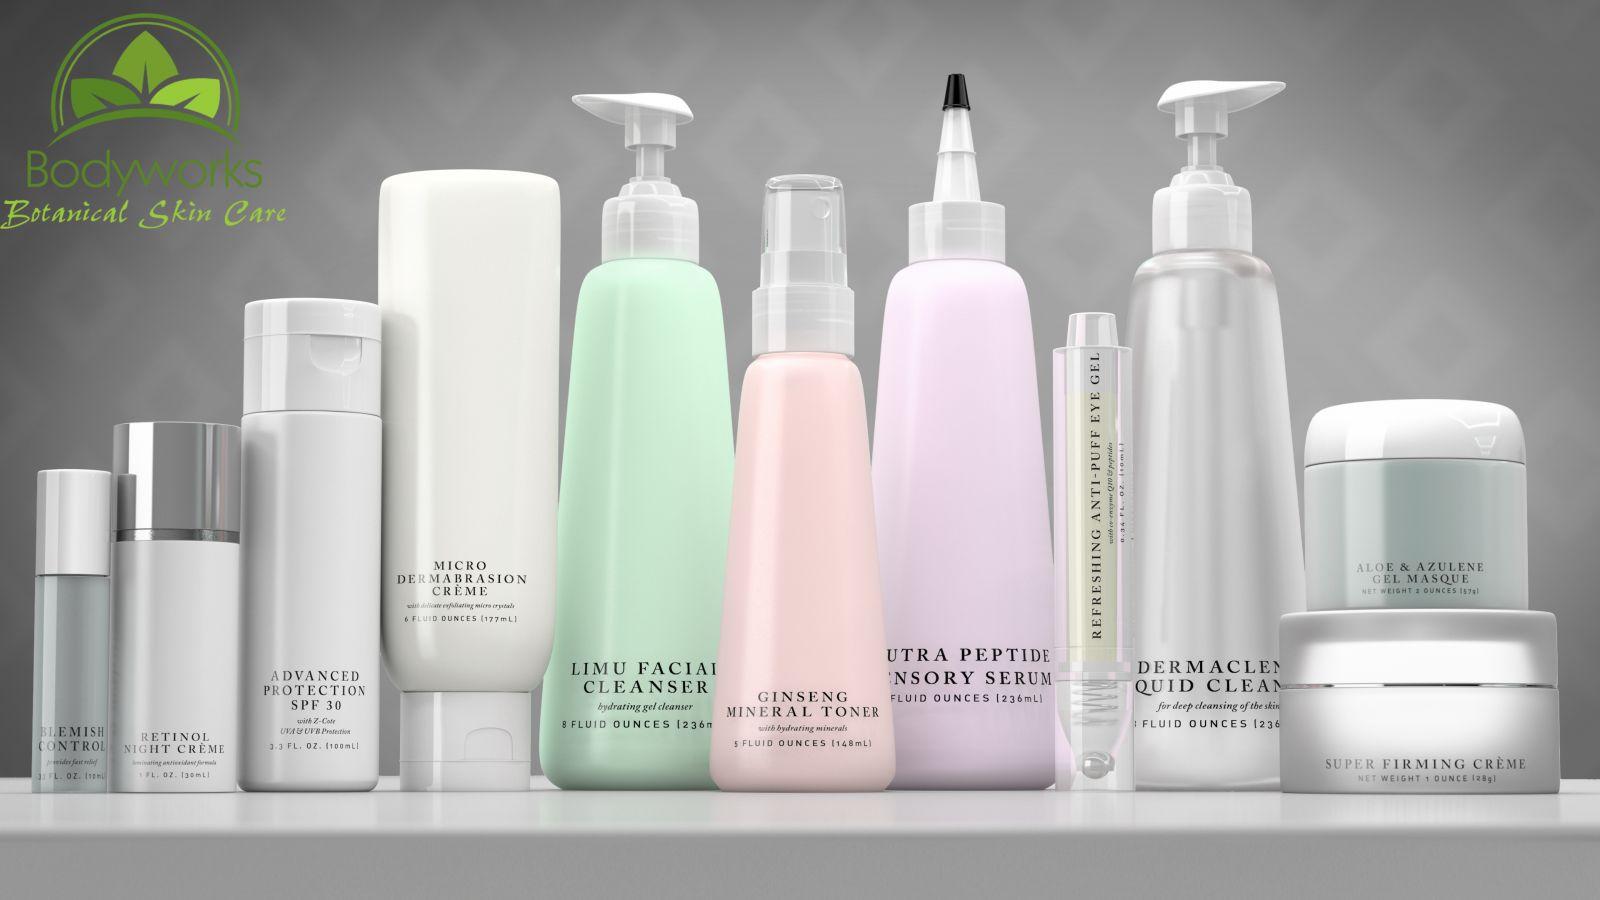 Bodyworks Botanical Skin Care